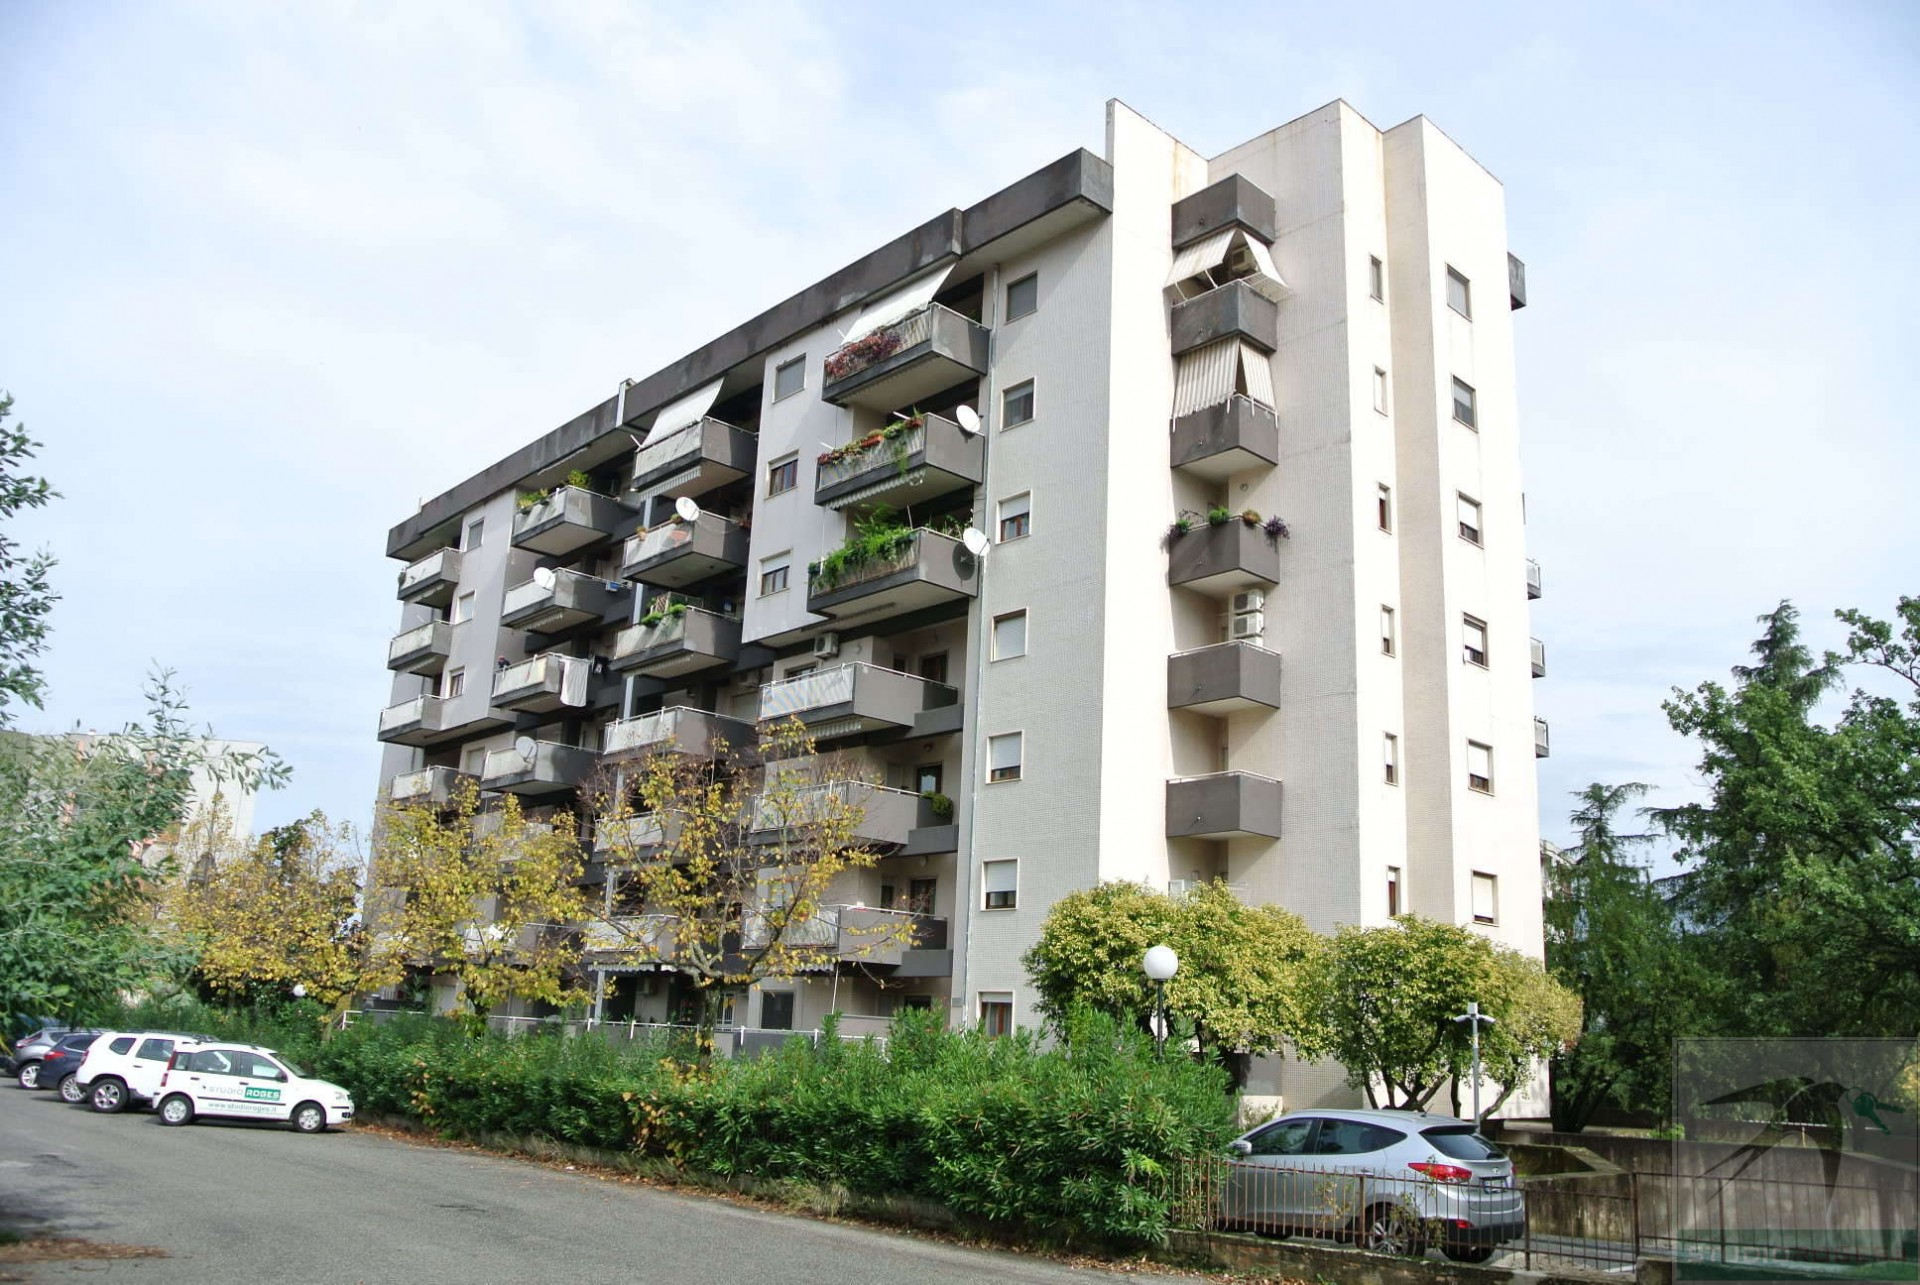 Appartamento in Vendita 135,78 mq - N. camere: 4 - - Rende - Roges-Commenda (CS)